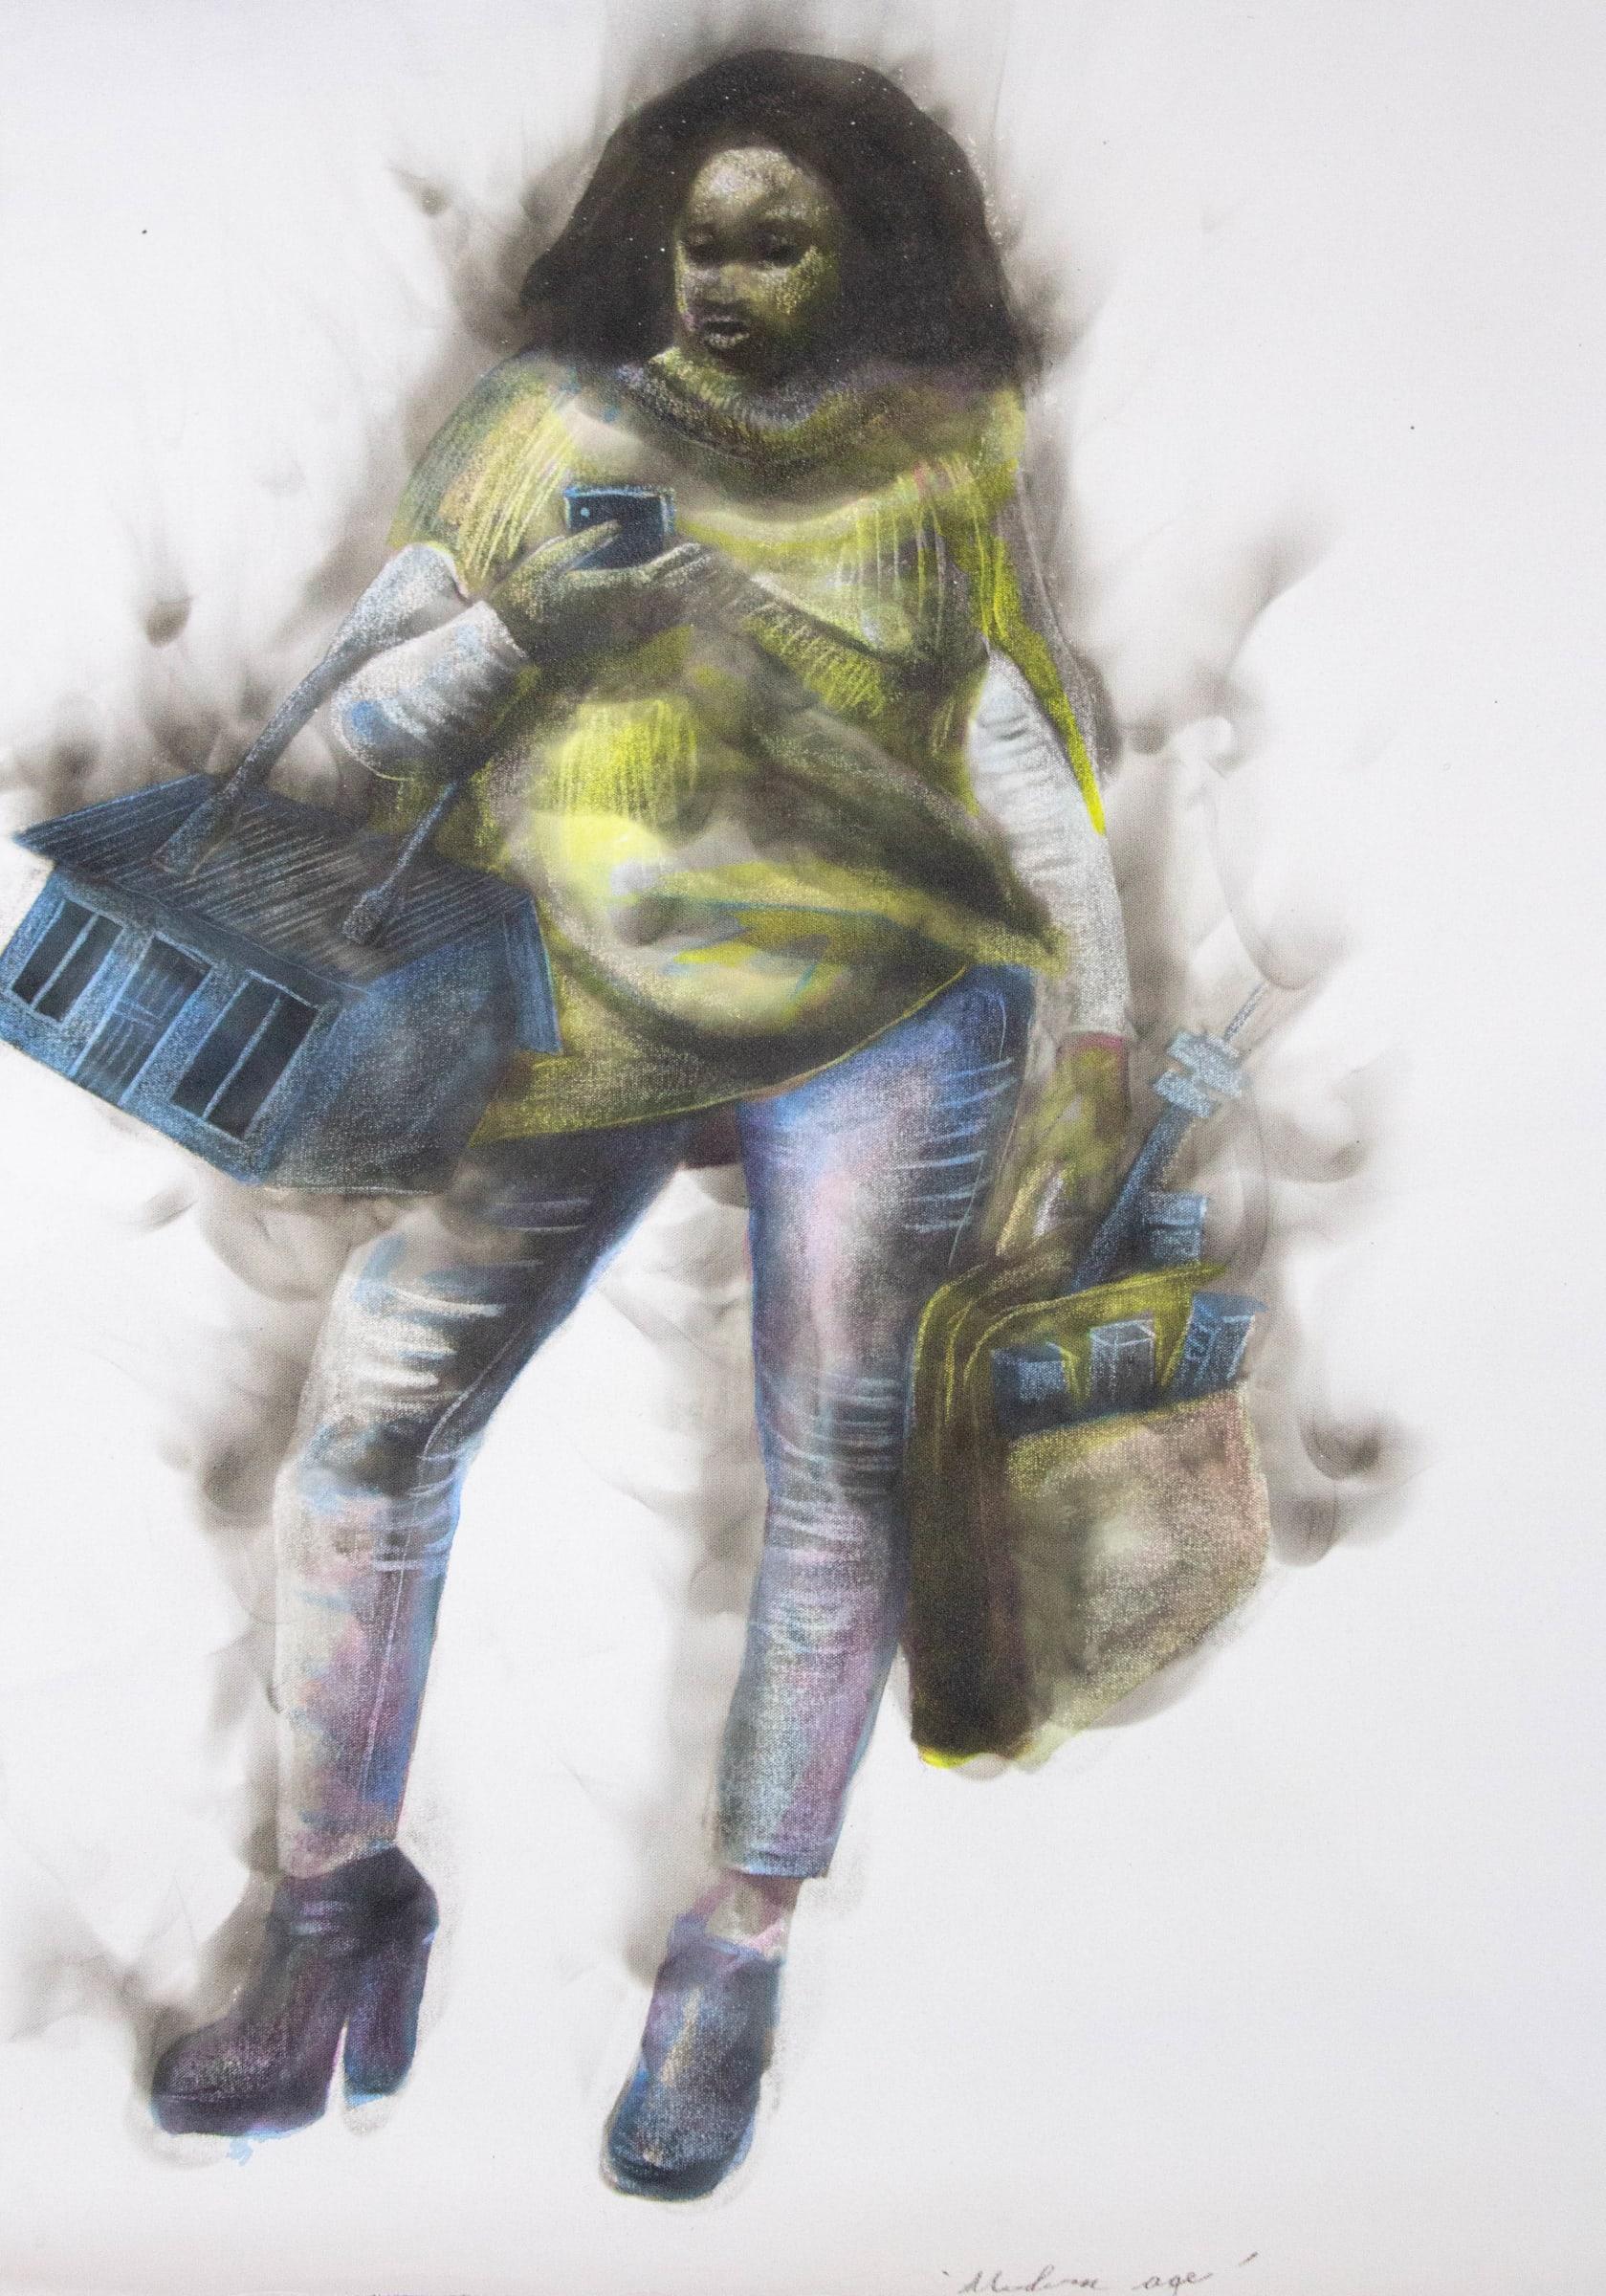 <span class=&#34;link fancybox-details-link&#34;><a href=&#34;/artists/54-azael-langa/works/2138-azael-langa-modern-age-2018/&#34;>View Detail Page</a></span><div class=&#34;artist&#34;><strong>Azael Langa</strong></div> <div class=&#34;title&#34;><em>Modern Age</em>, 2018</div> <div class=&#34;medium&#34;>Smoke And Ink  On Canvas</div> <div class=&#34;dimensions&#34;>100cm x 82cm (117.5cm x 96cm framed)</div>